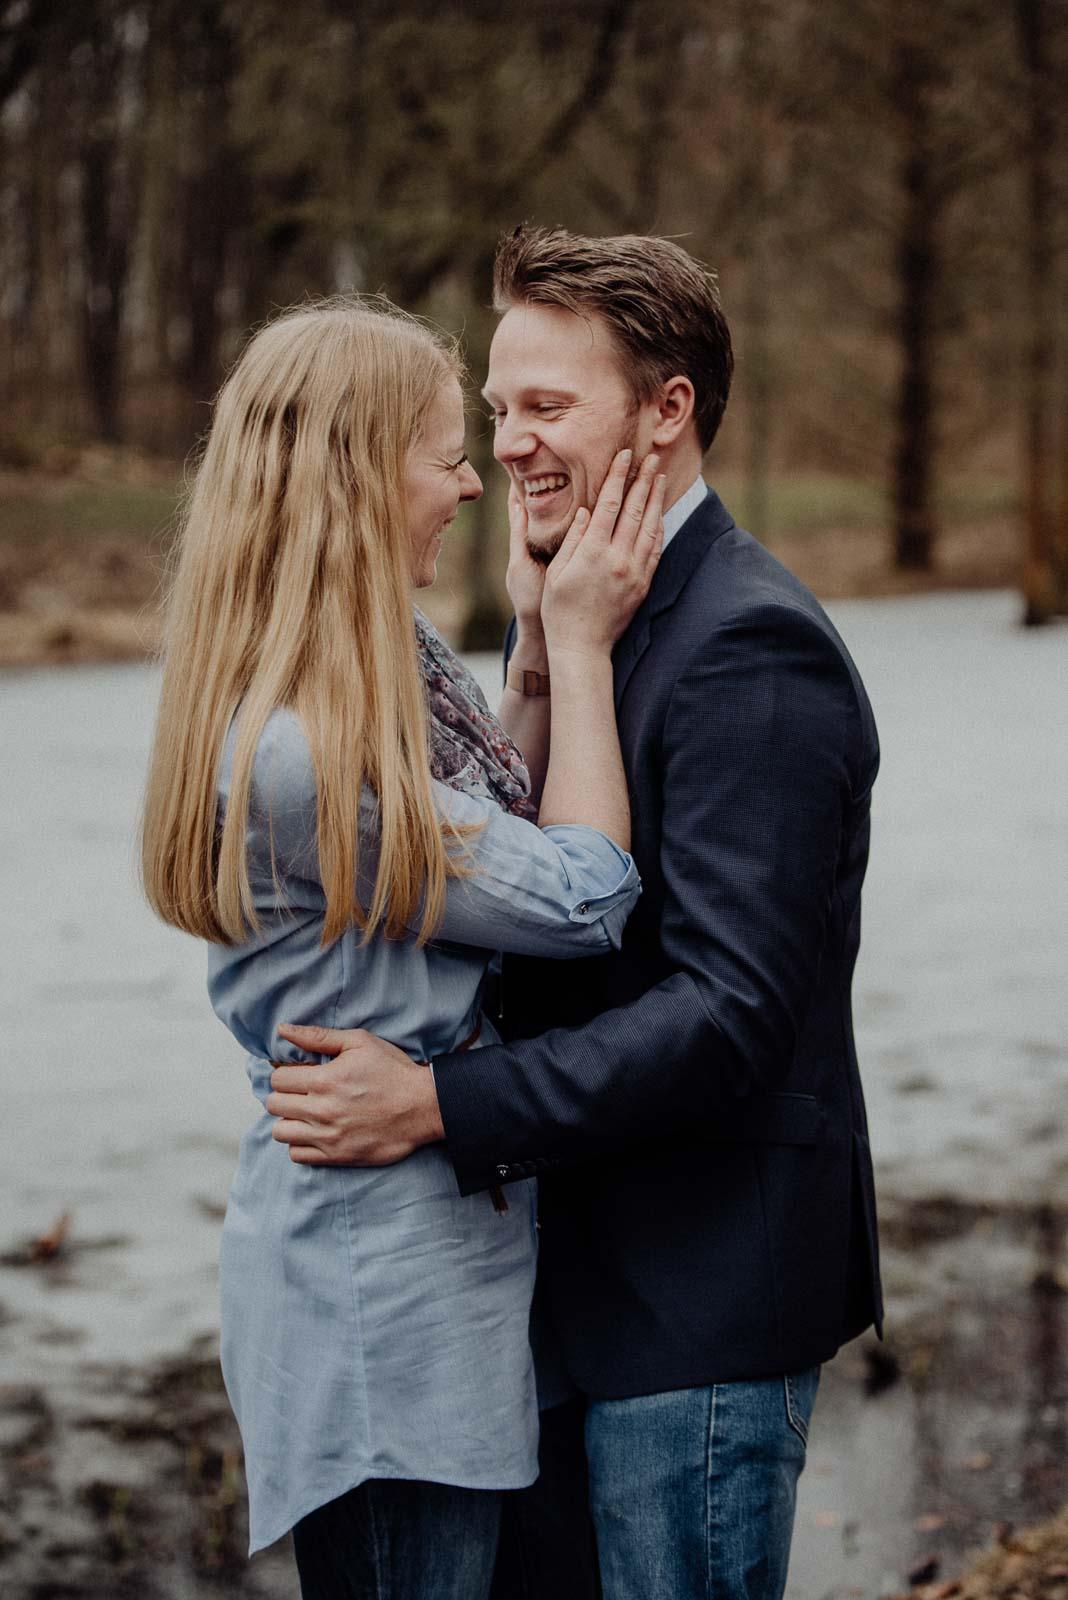 009-verlobungsshooting-engagement-fotograf-witten-rombergpark-dortmund